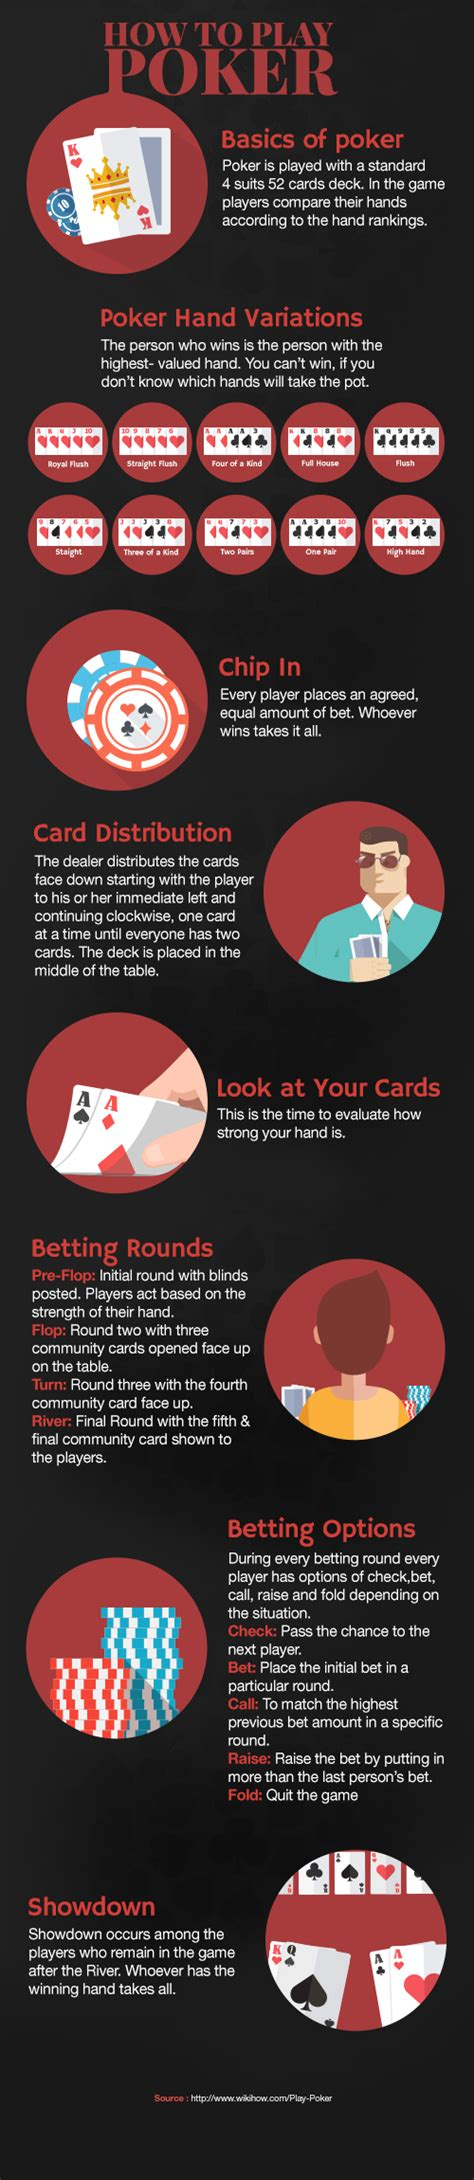 daftar taruhan omaha  termurah promosi cashback deposit  ribu poker idn slot